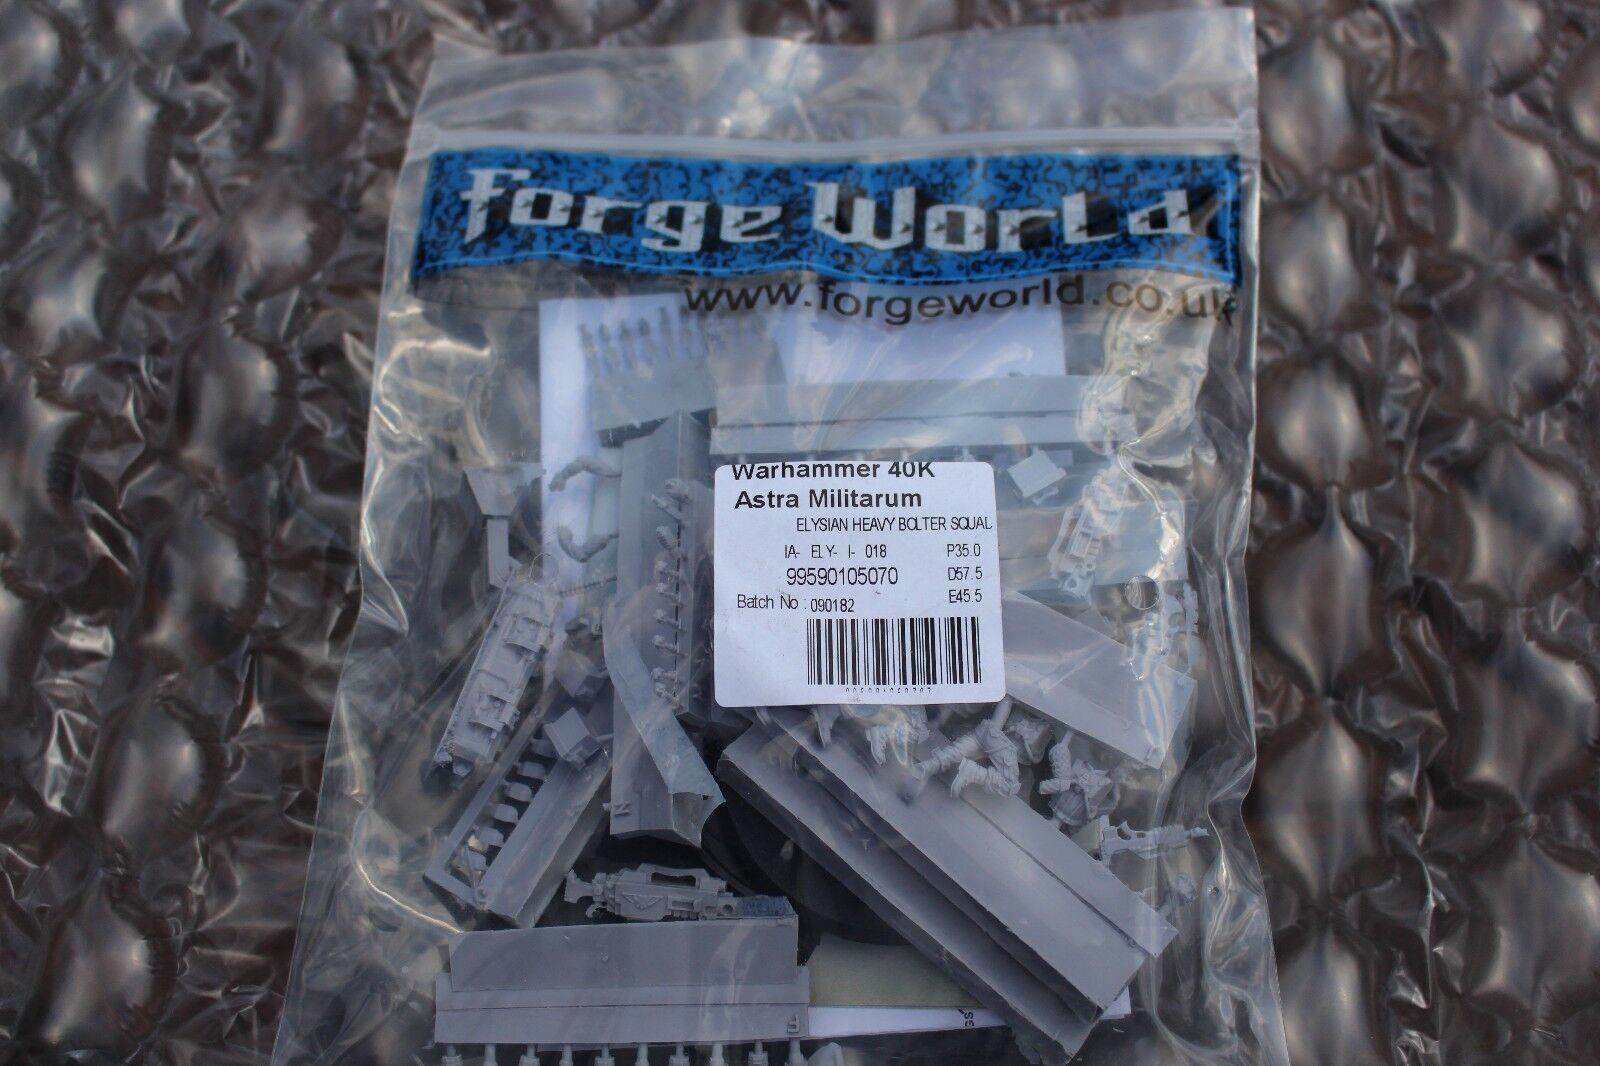 Juego Works Hammer 40k forjador world world world Happy World Heavy Bolt Team New OOP d4e